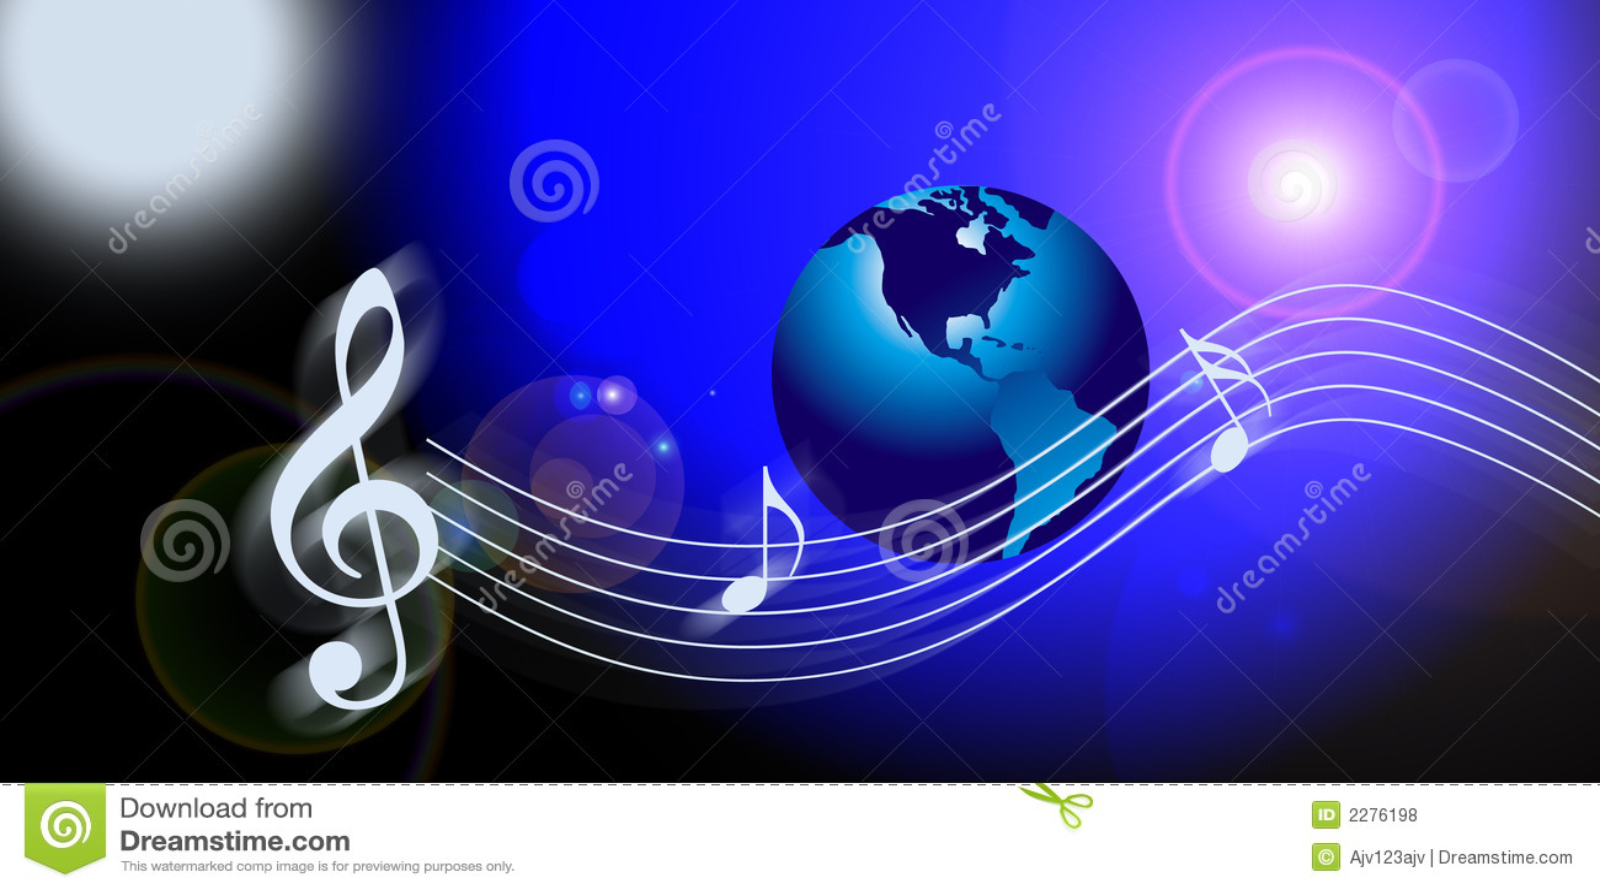 internet-music-world-notes-2276198.jpg